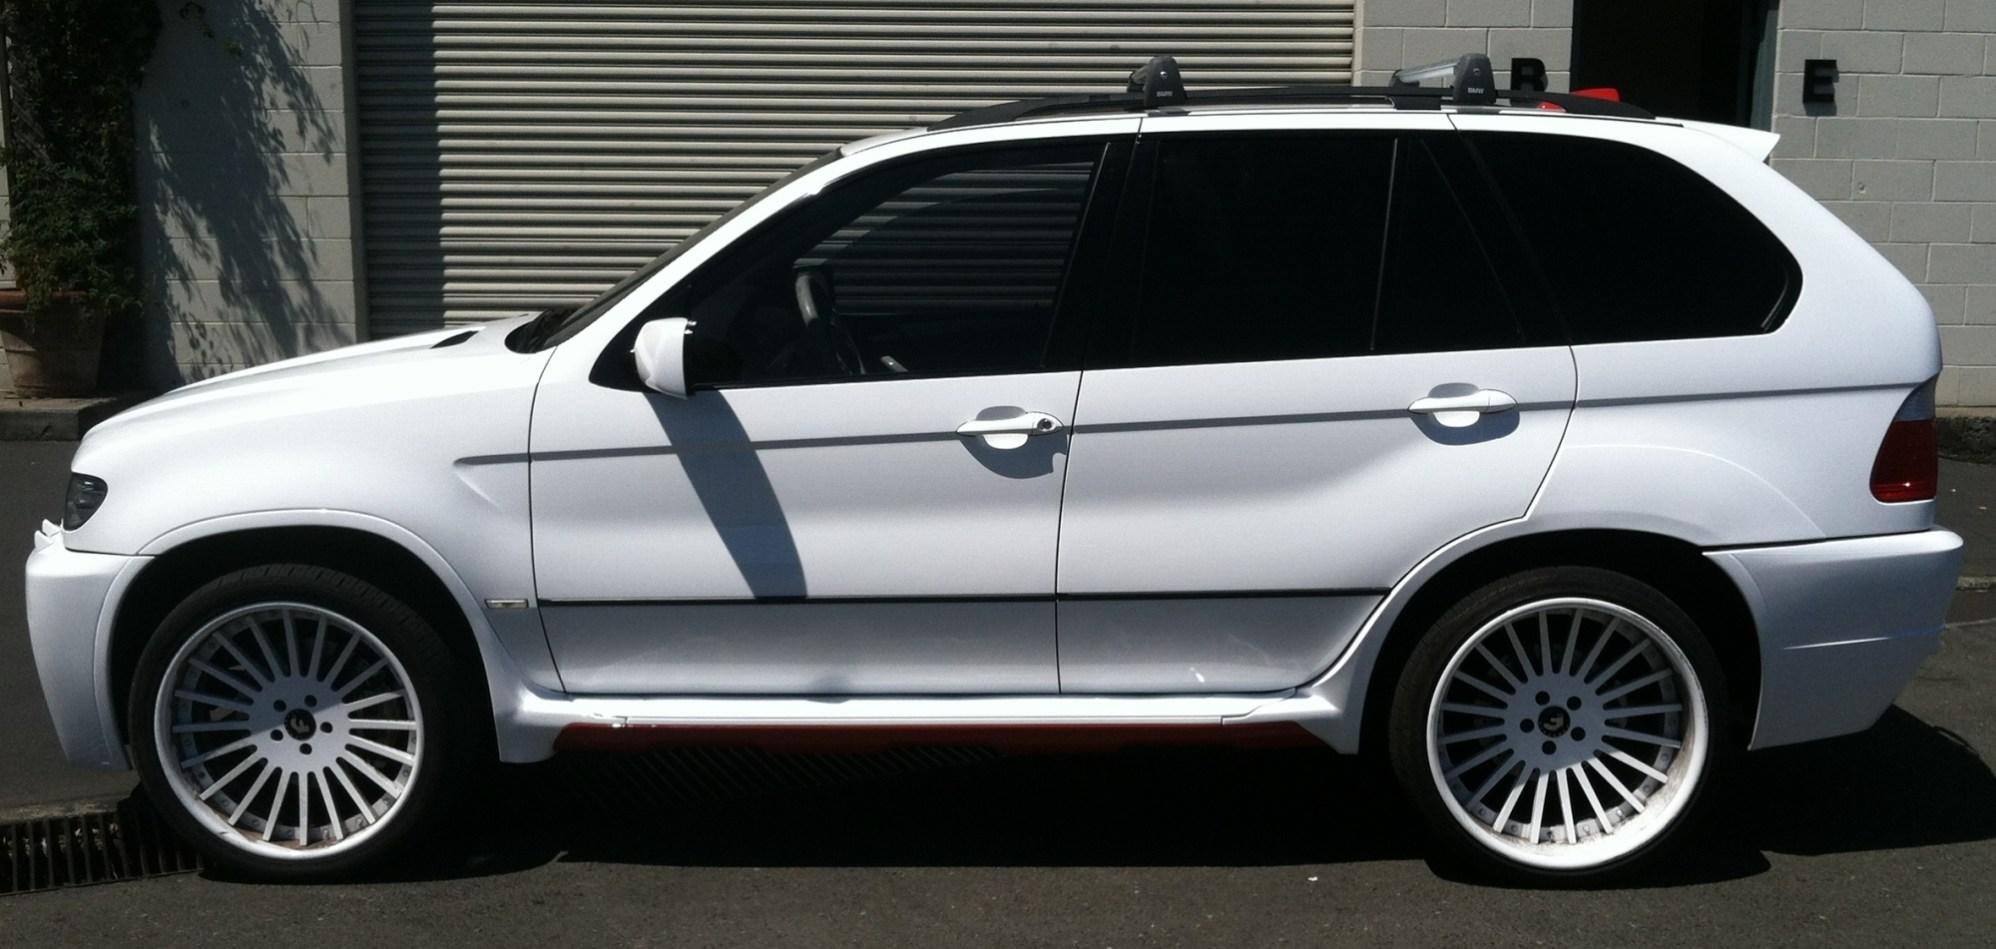 BMW Suv Color Change Wrap-21